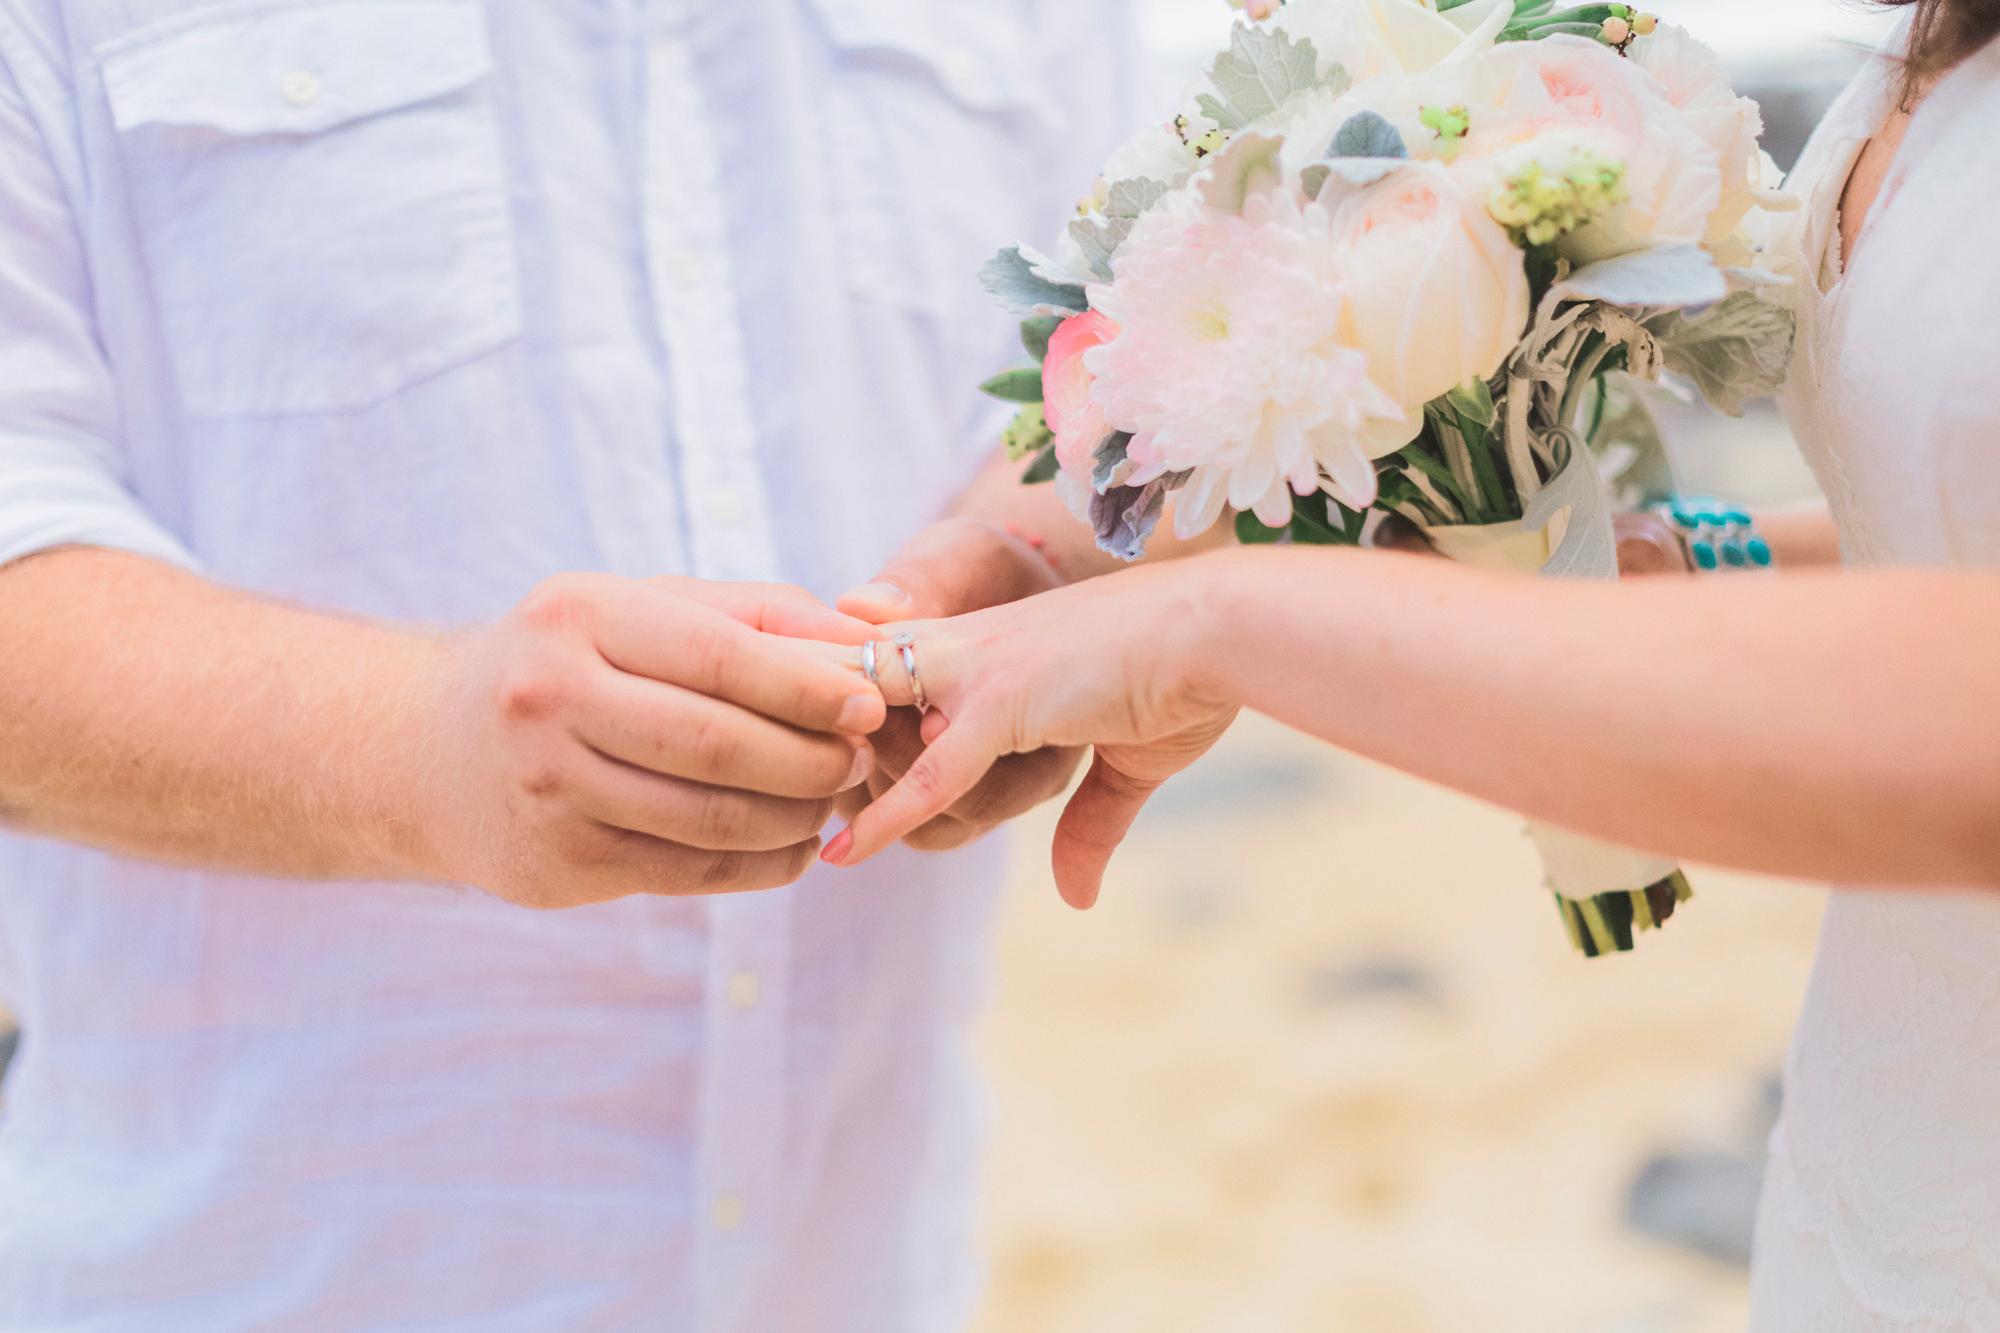 angie-diaz-photography-maui-elopement-pamela-jorg-10.jpg